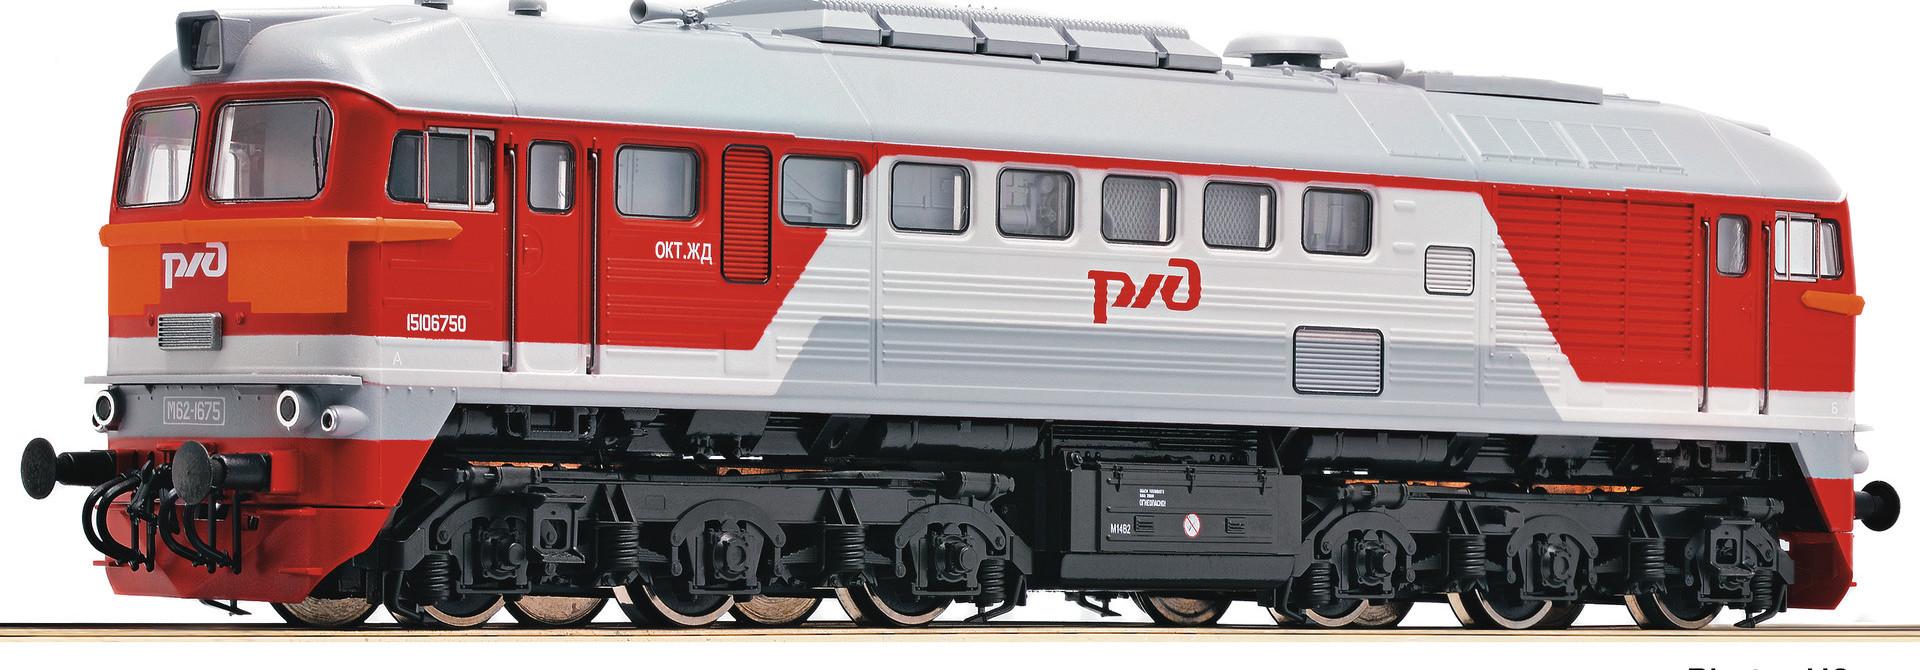 725210 Diesellok M62, rot/grau